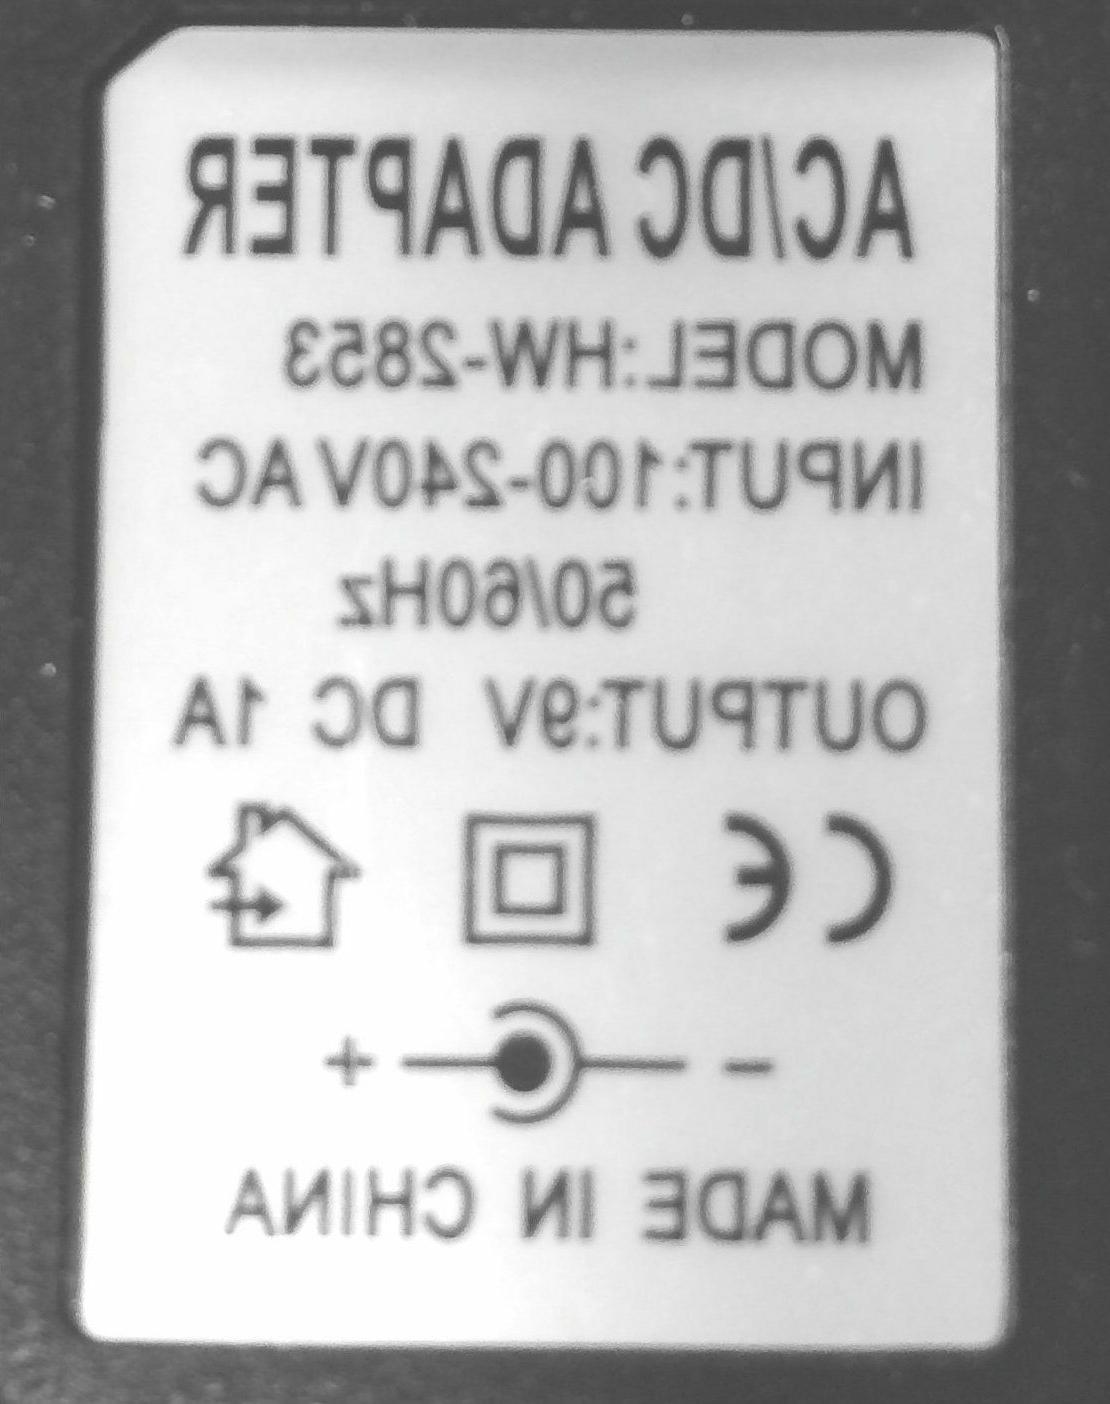 AC POWER SUPPLY ProForm Bike PowerCord - Adaptor - 9volt